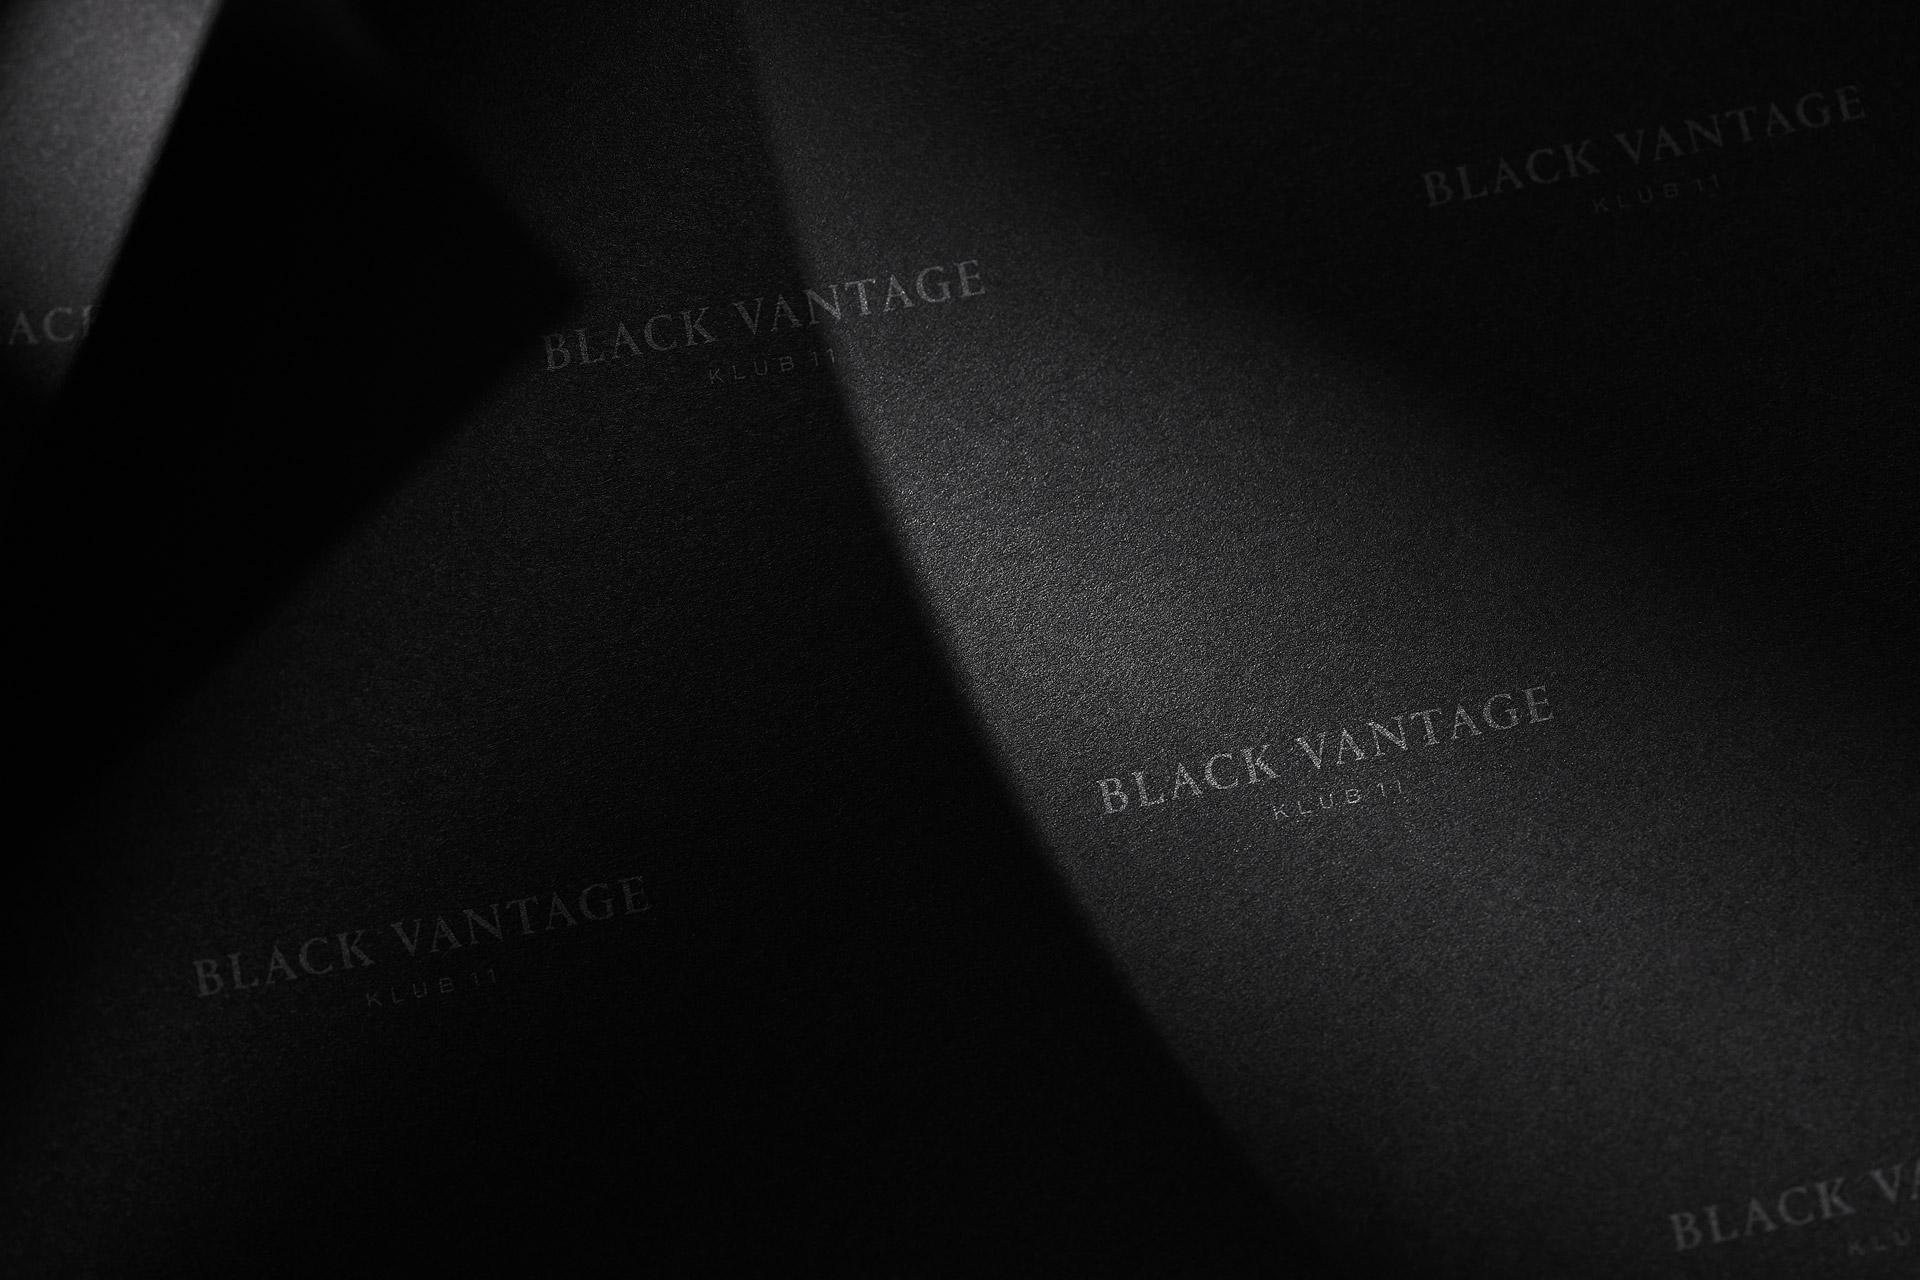 black-vantage_17